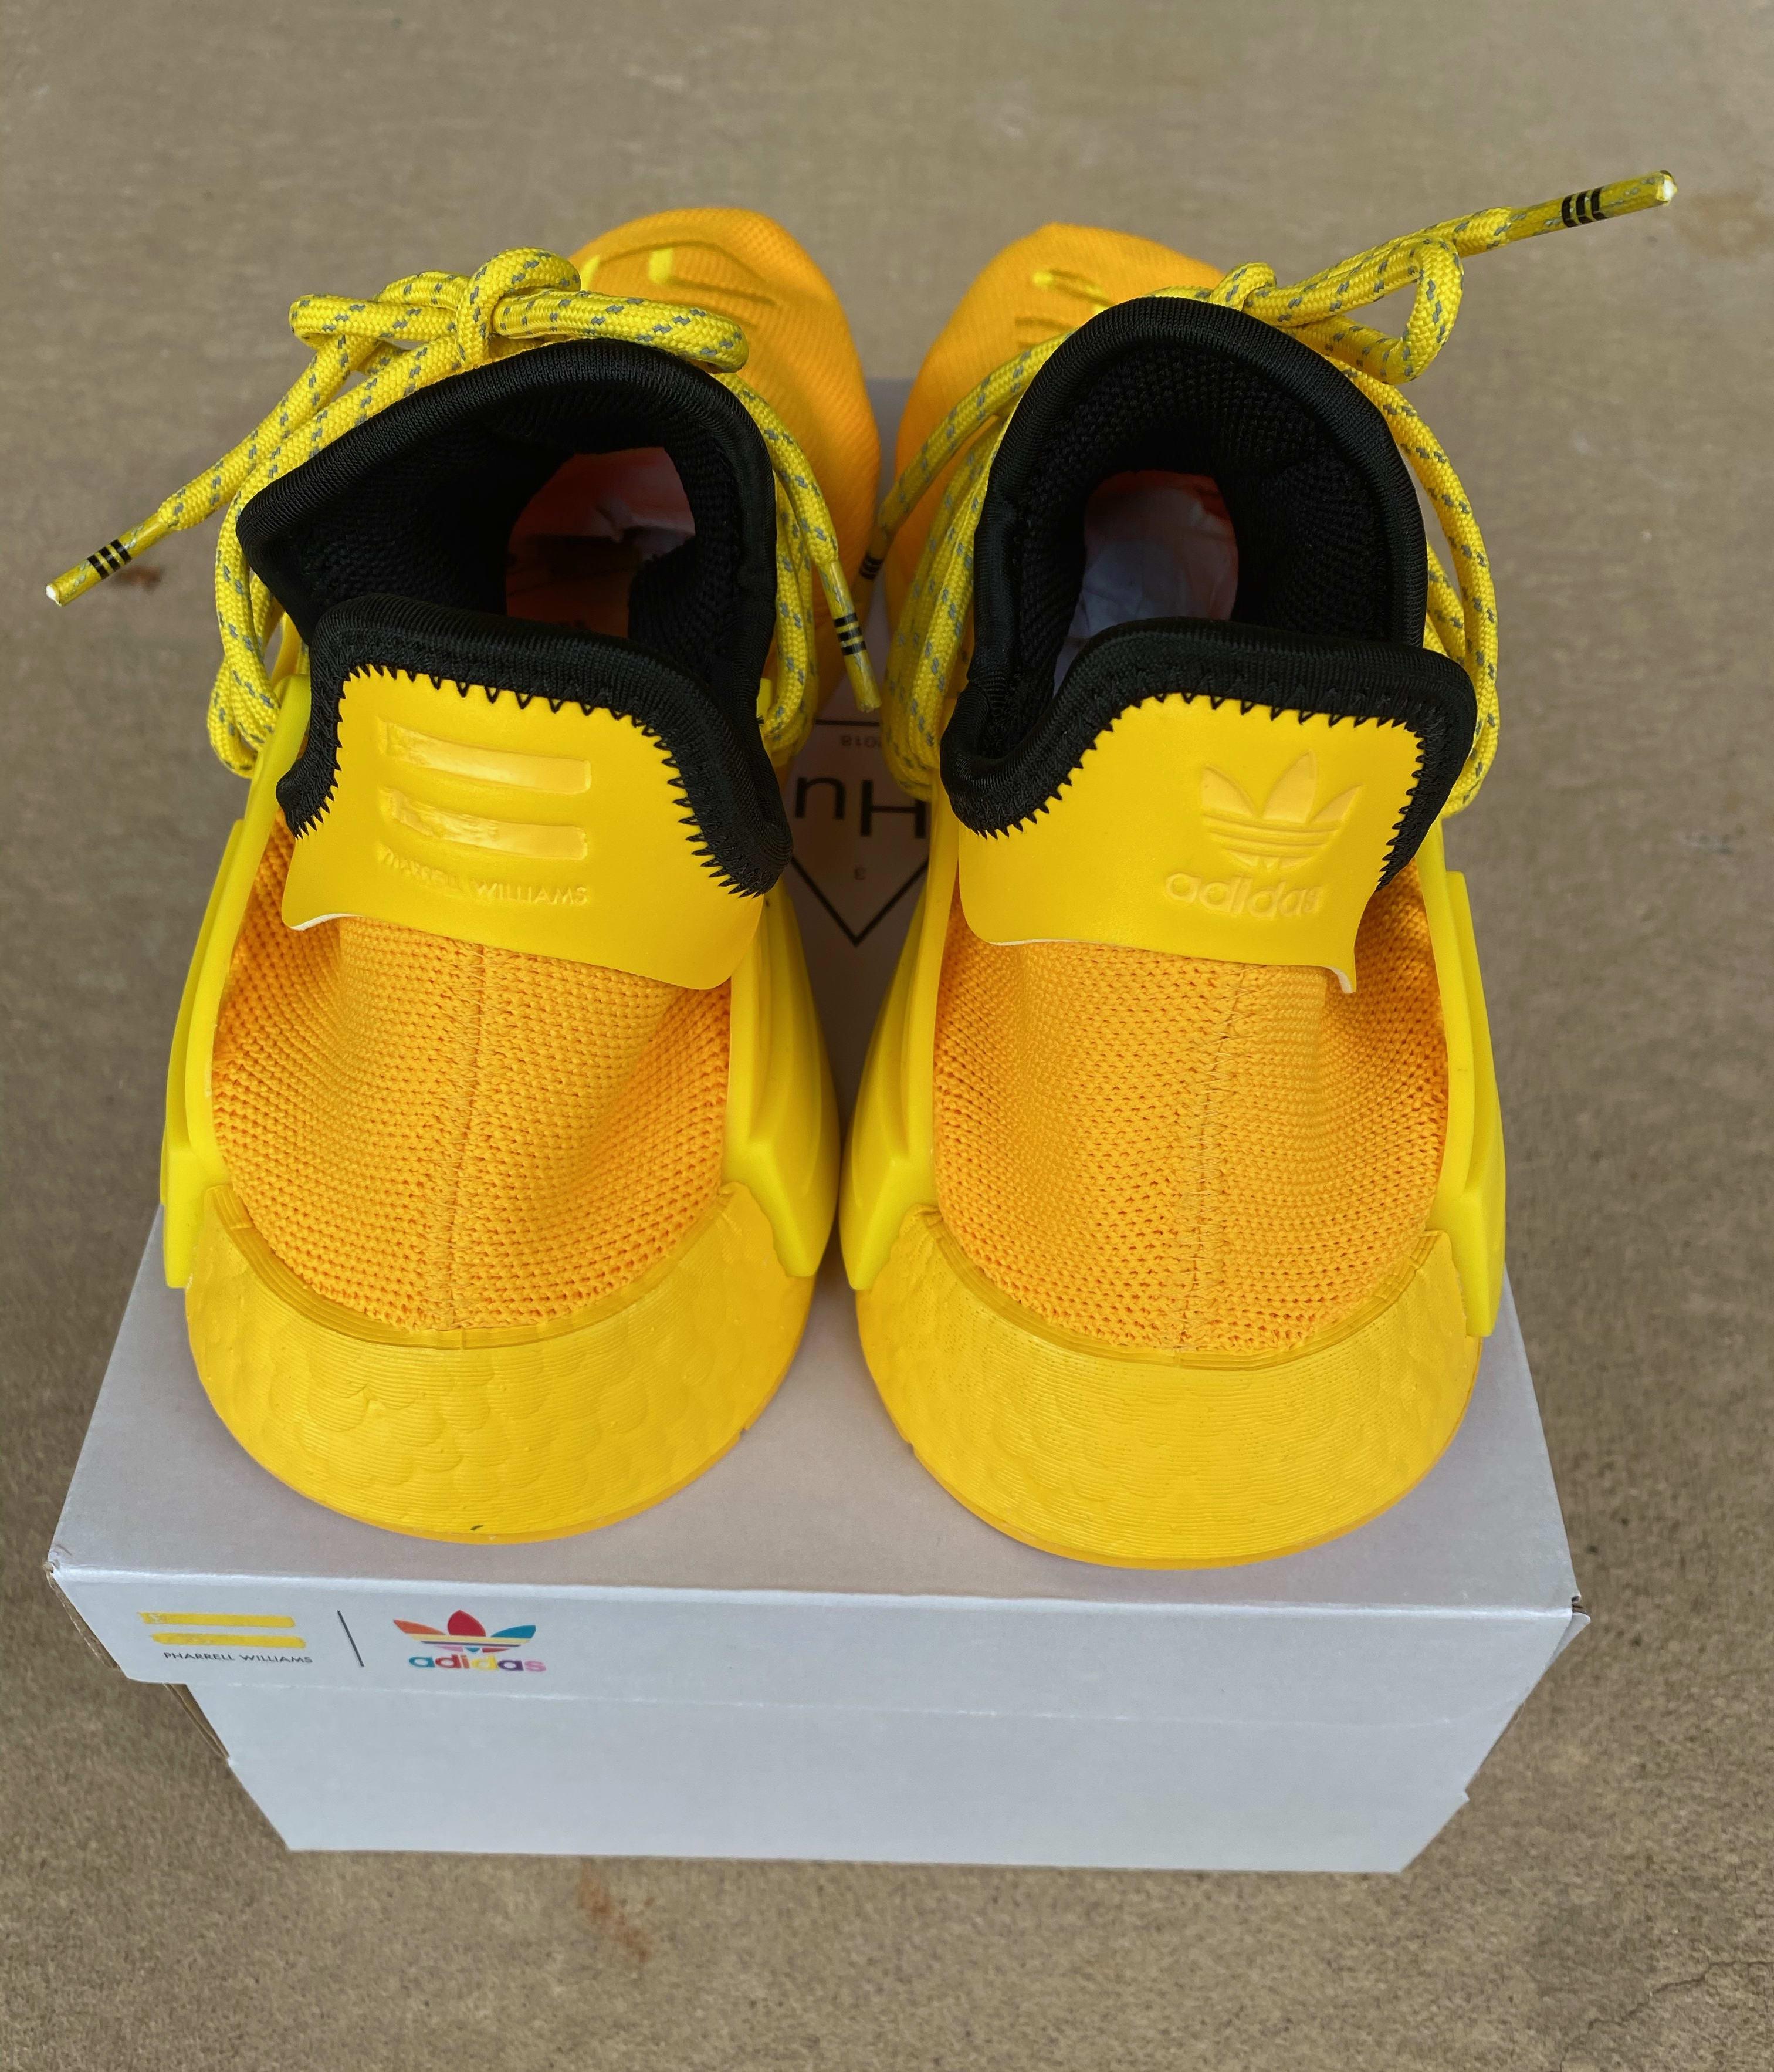 Pharrell x Adidas NMD Hu 'Yellow' GY0091 Heel